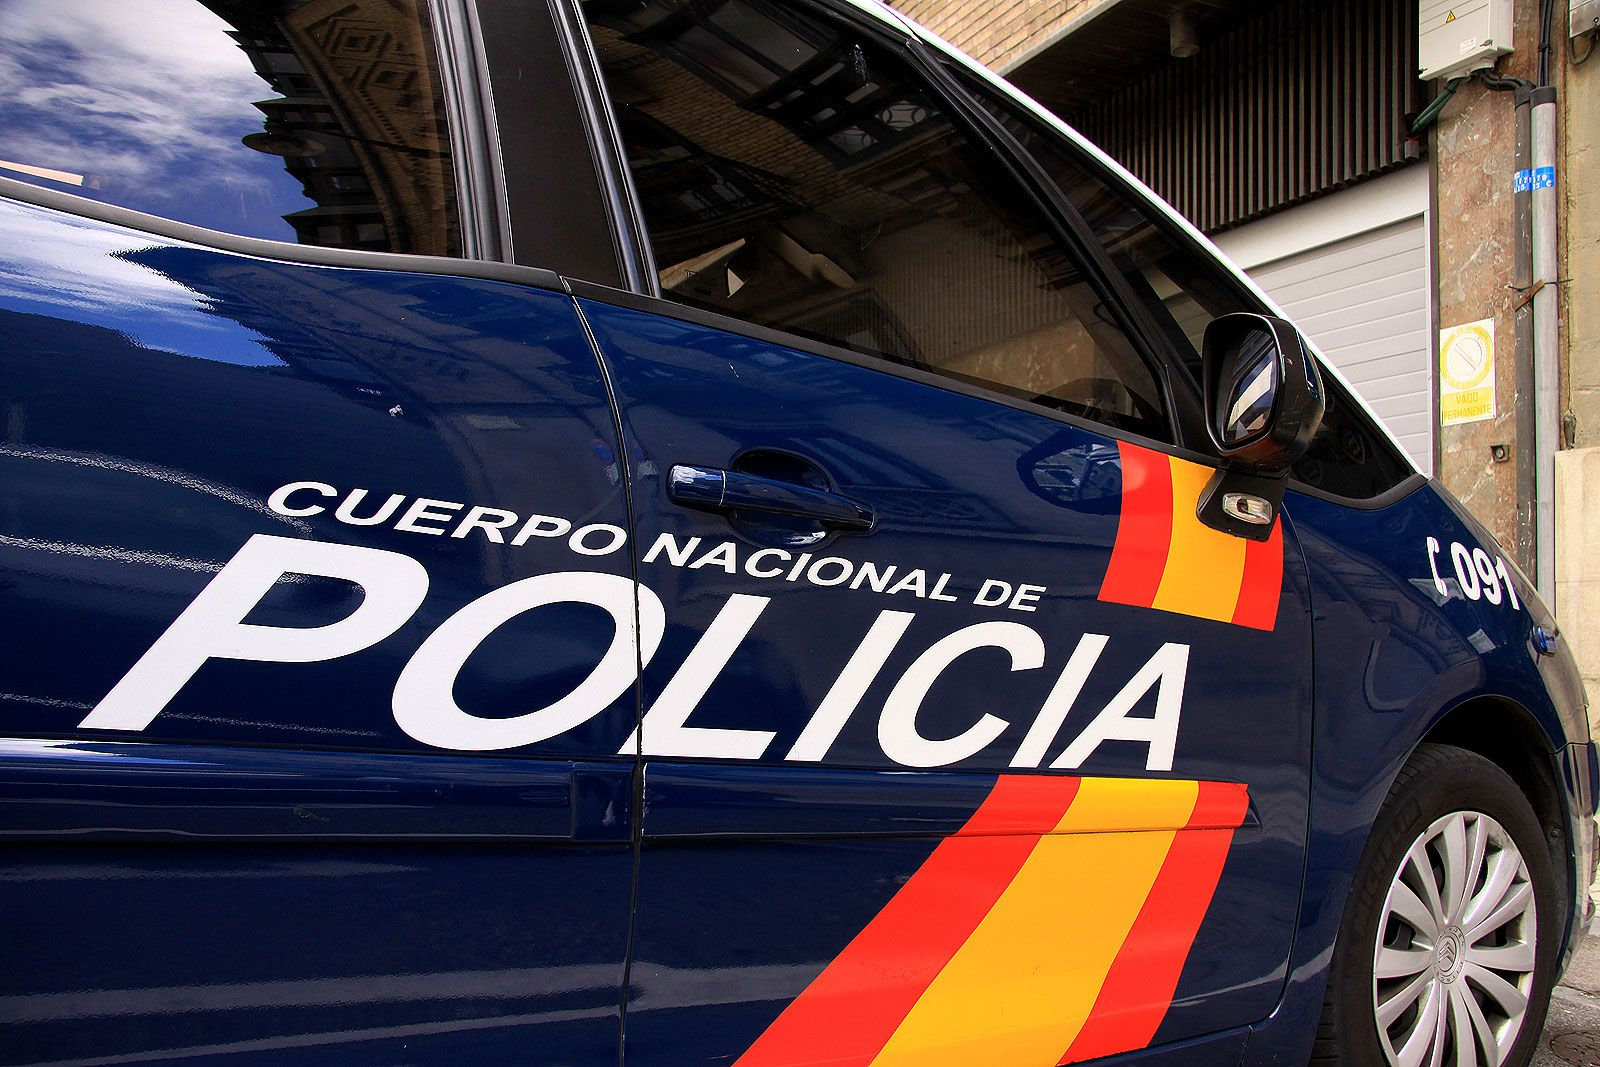 Asesinato en Jerez: Investigan si se trata de un caso de violencia de género